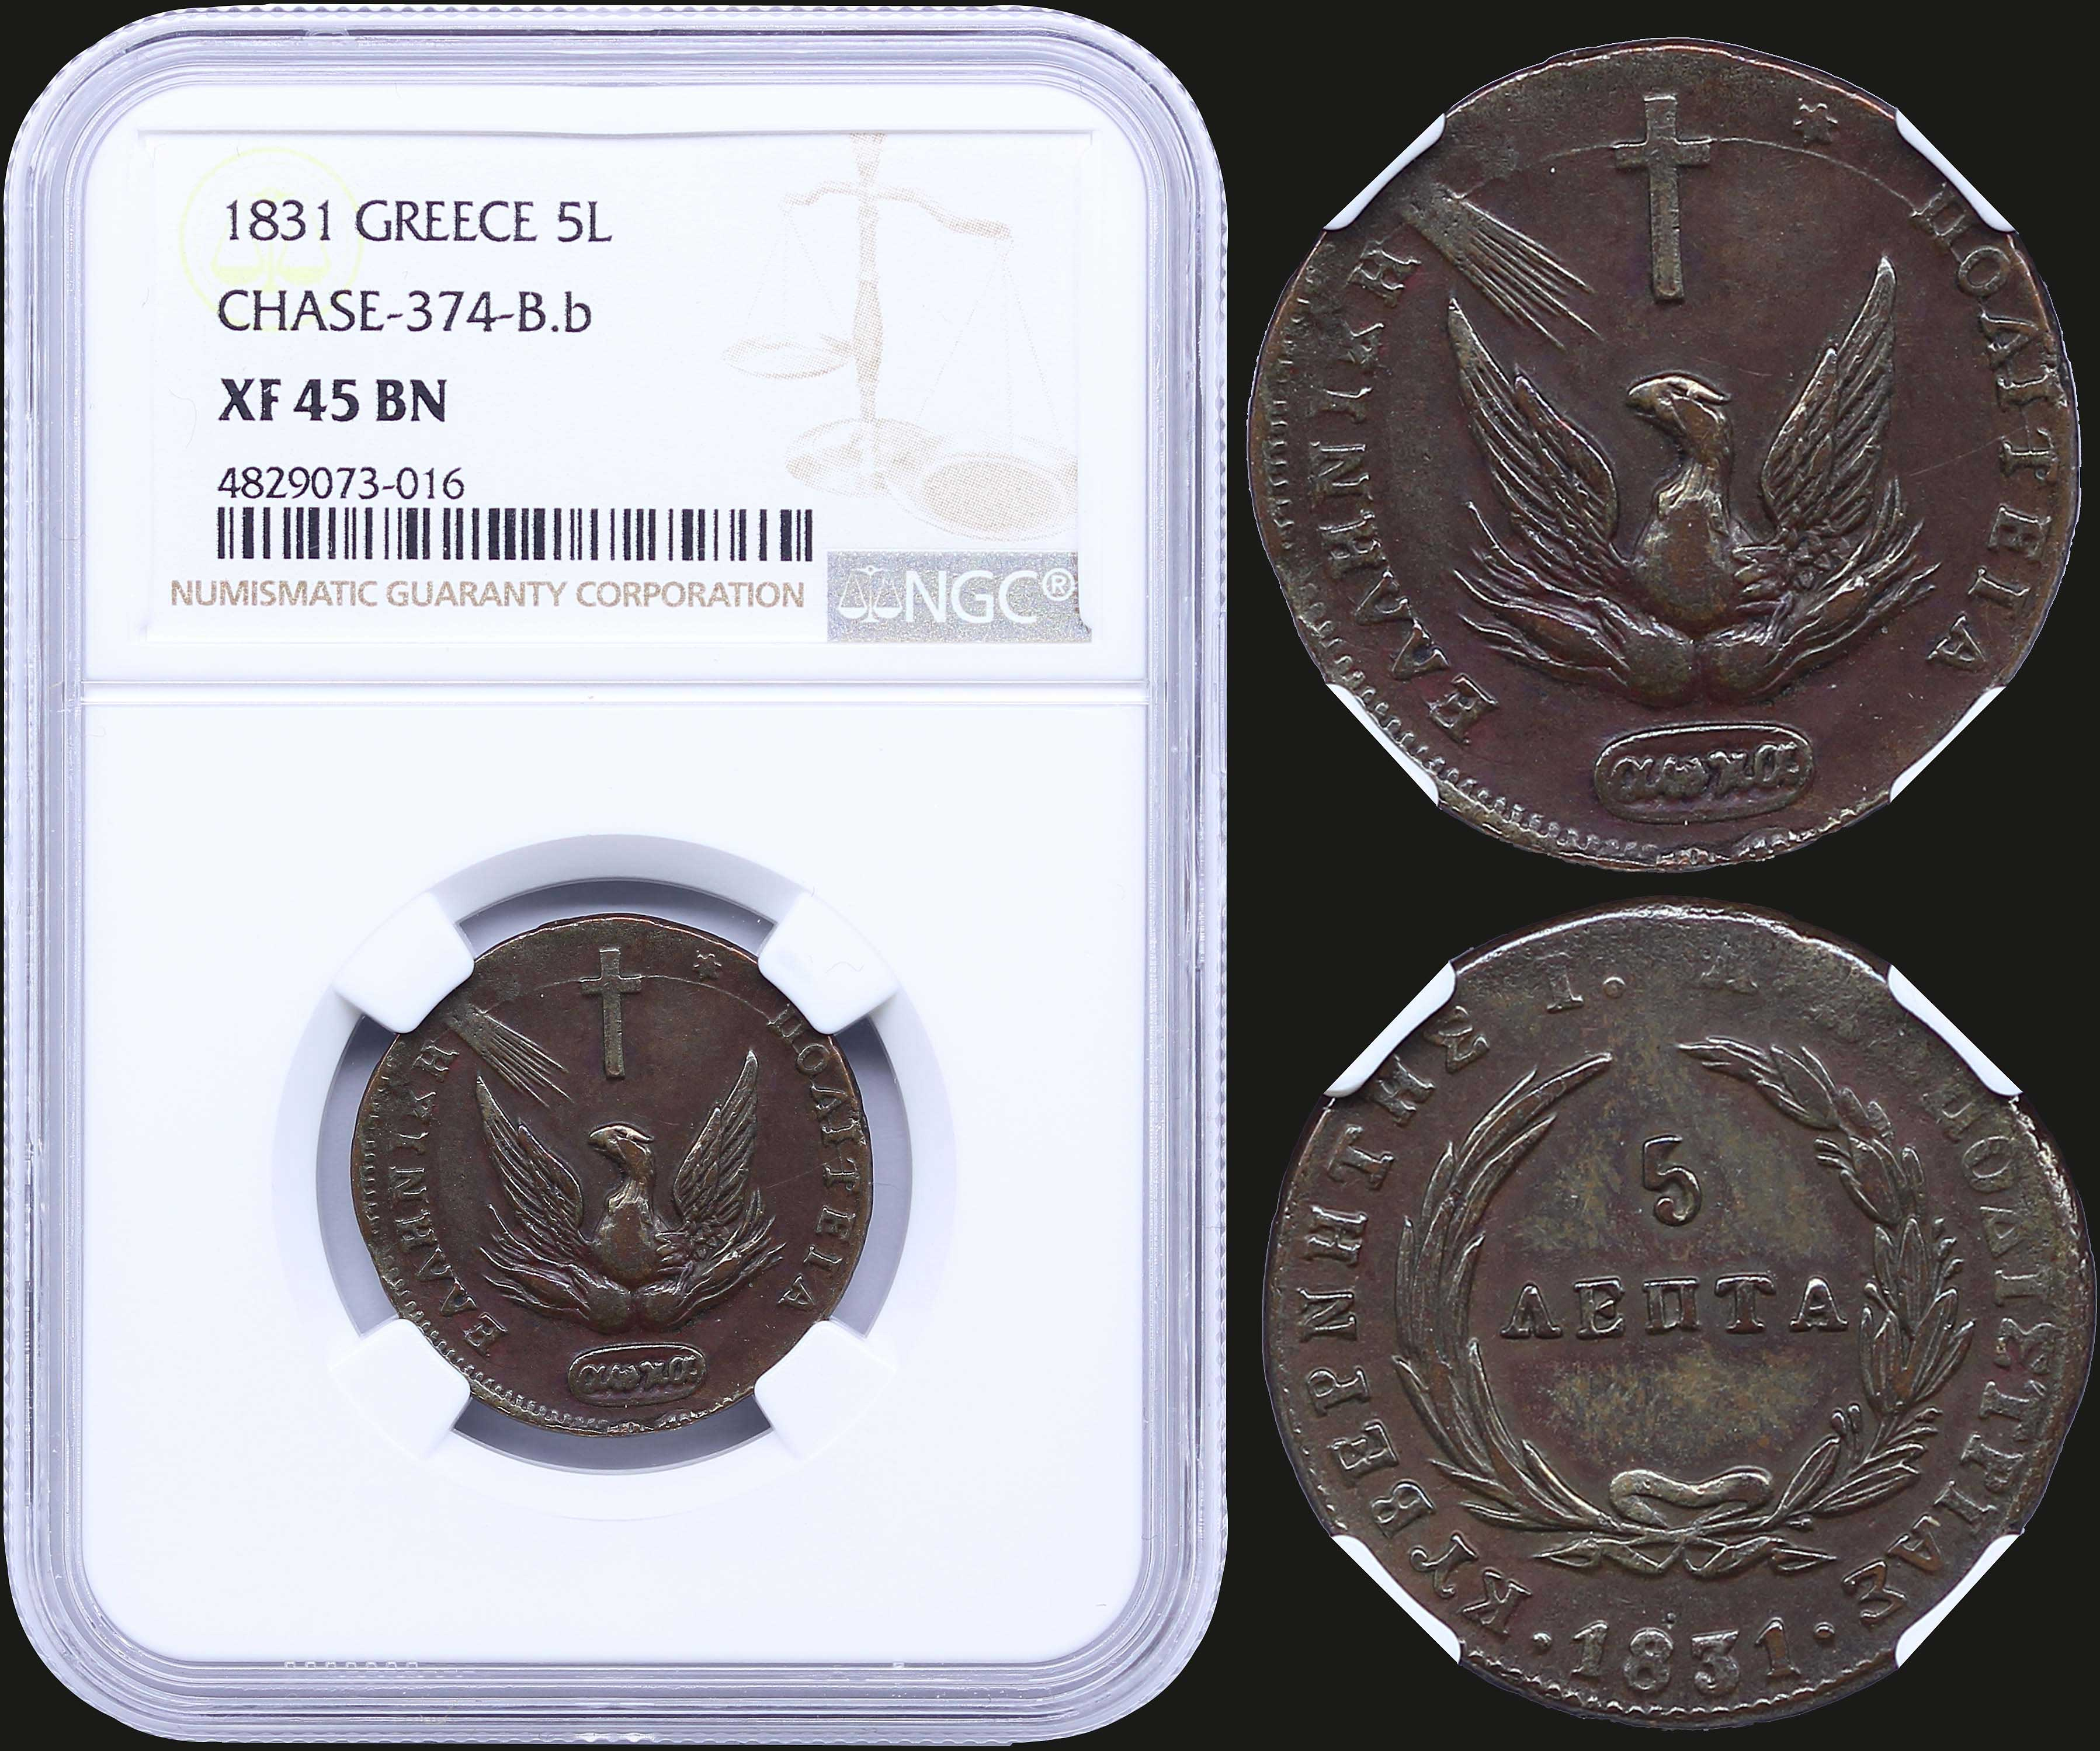 Lot 8043 - -  COINS & TOKENS governor capodistrias -  A. Karamitsos Public & Live Bid Auction 644 Coins, Medals & Banknotes